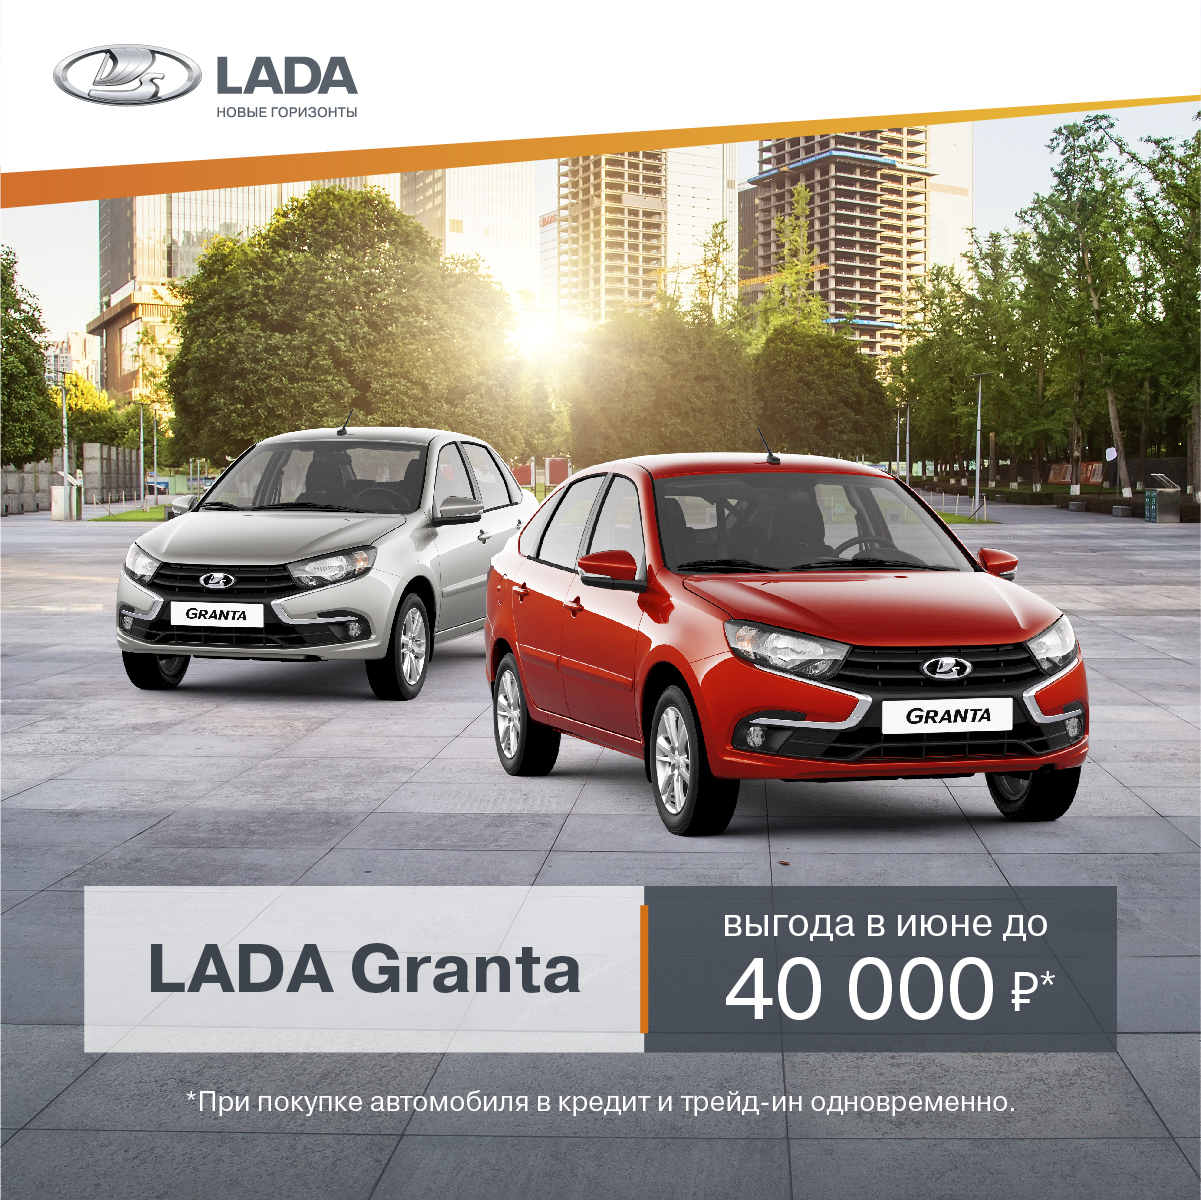 LADA Granta с выгодой до 40 000 руб.